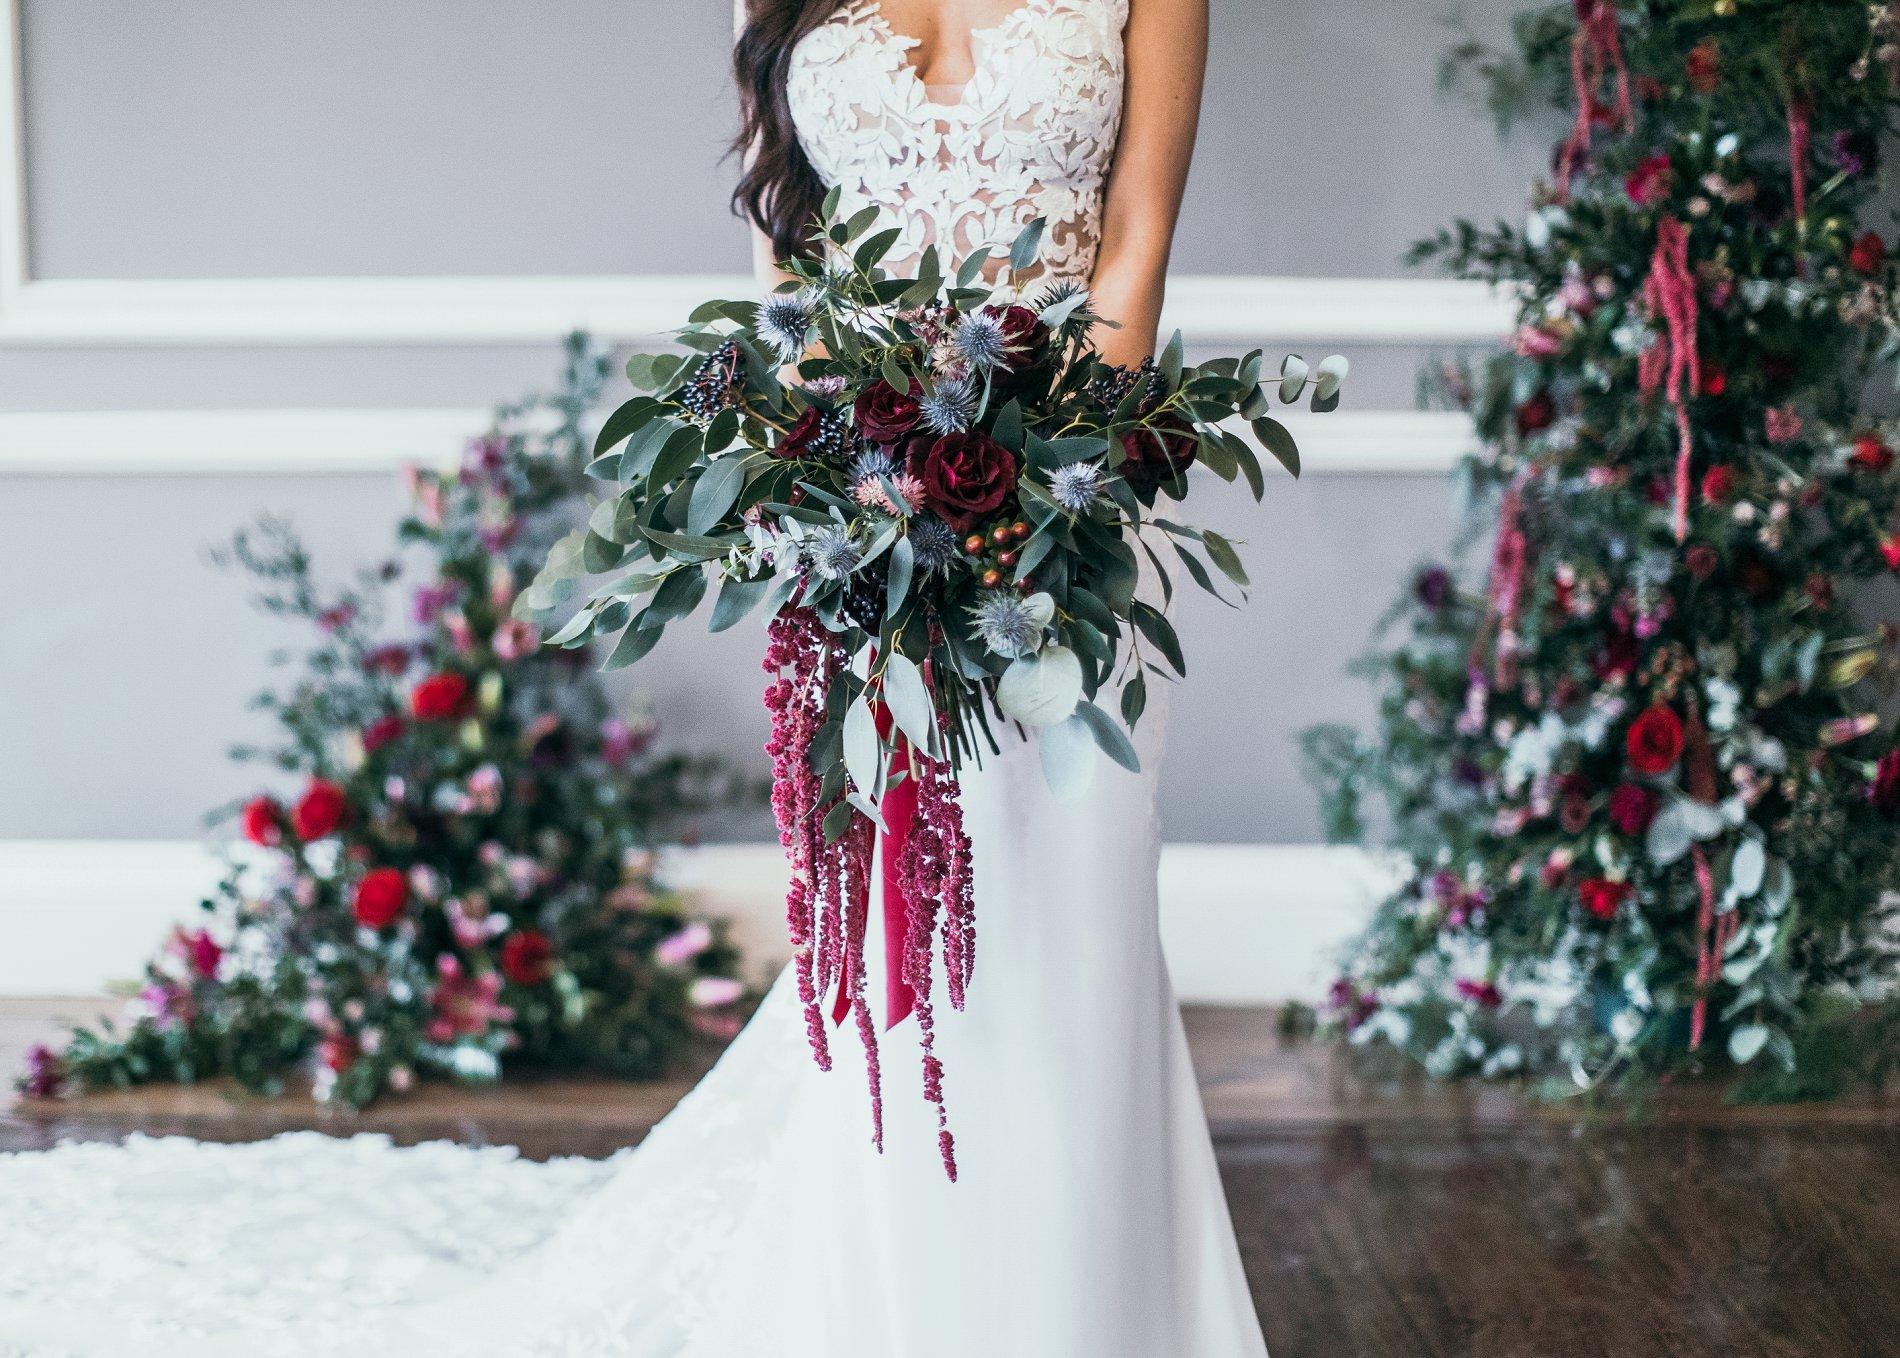 A Black Tie Wedding Creative Shoot at Saltmarshe Hall (c) Natalie Hamilton Photography (10)